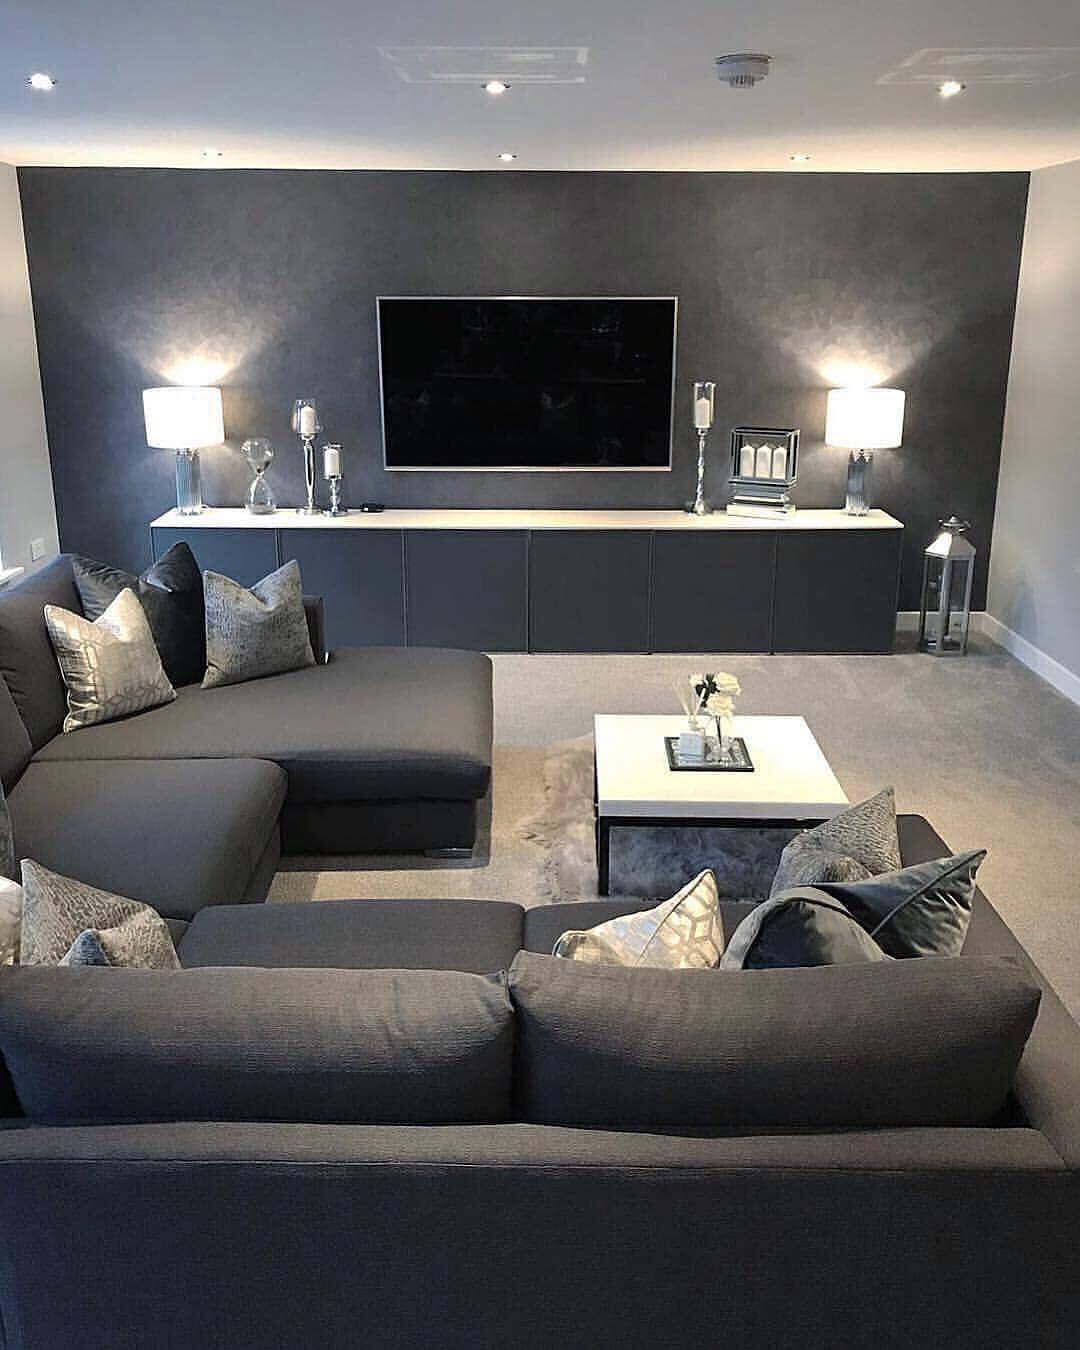 Fat studios on instagram   fatstudios  inspiring living room by our montreux home also best decorating ideas designs interior design rh pinterest